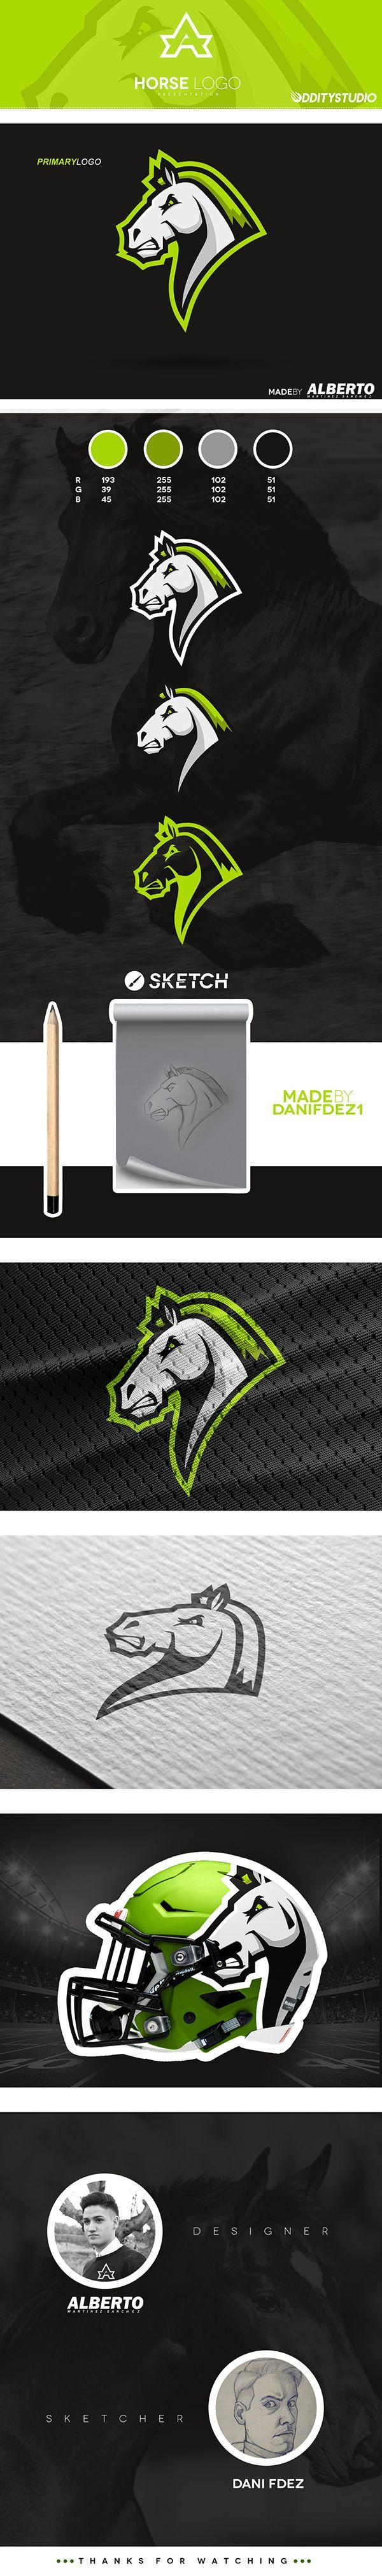 Horse Mascot Logo, for sale